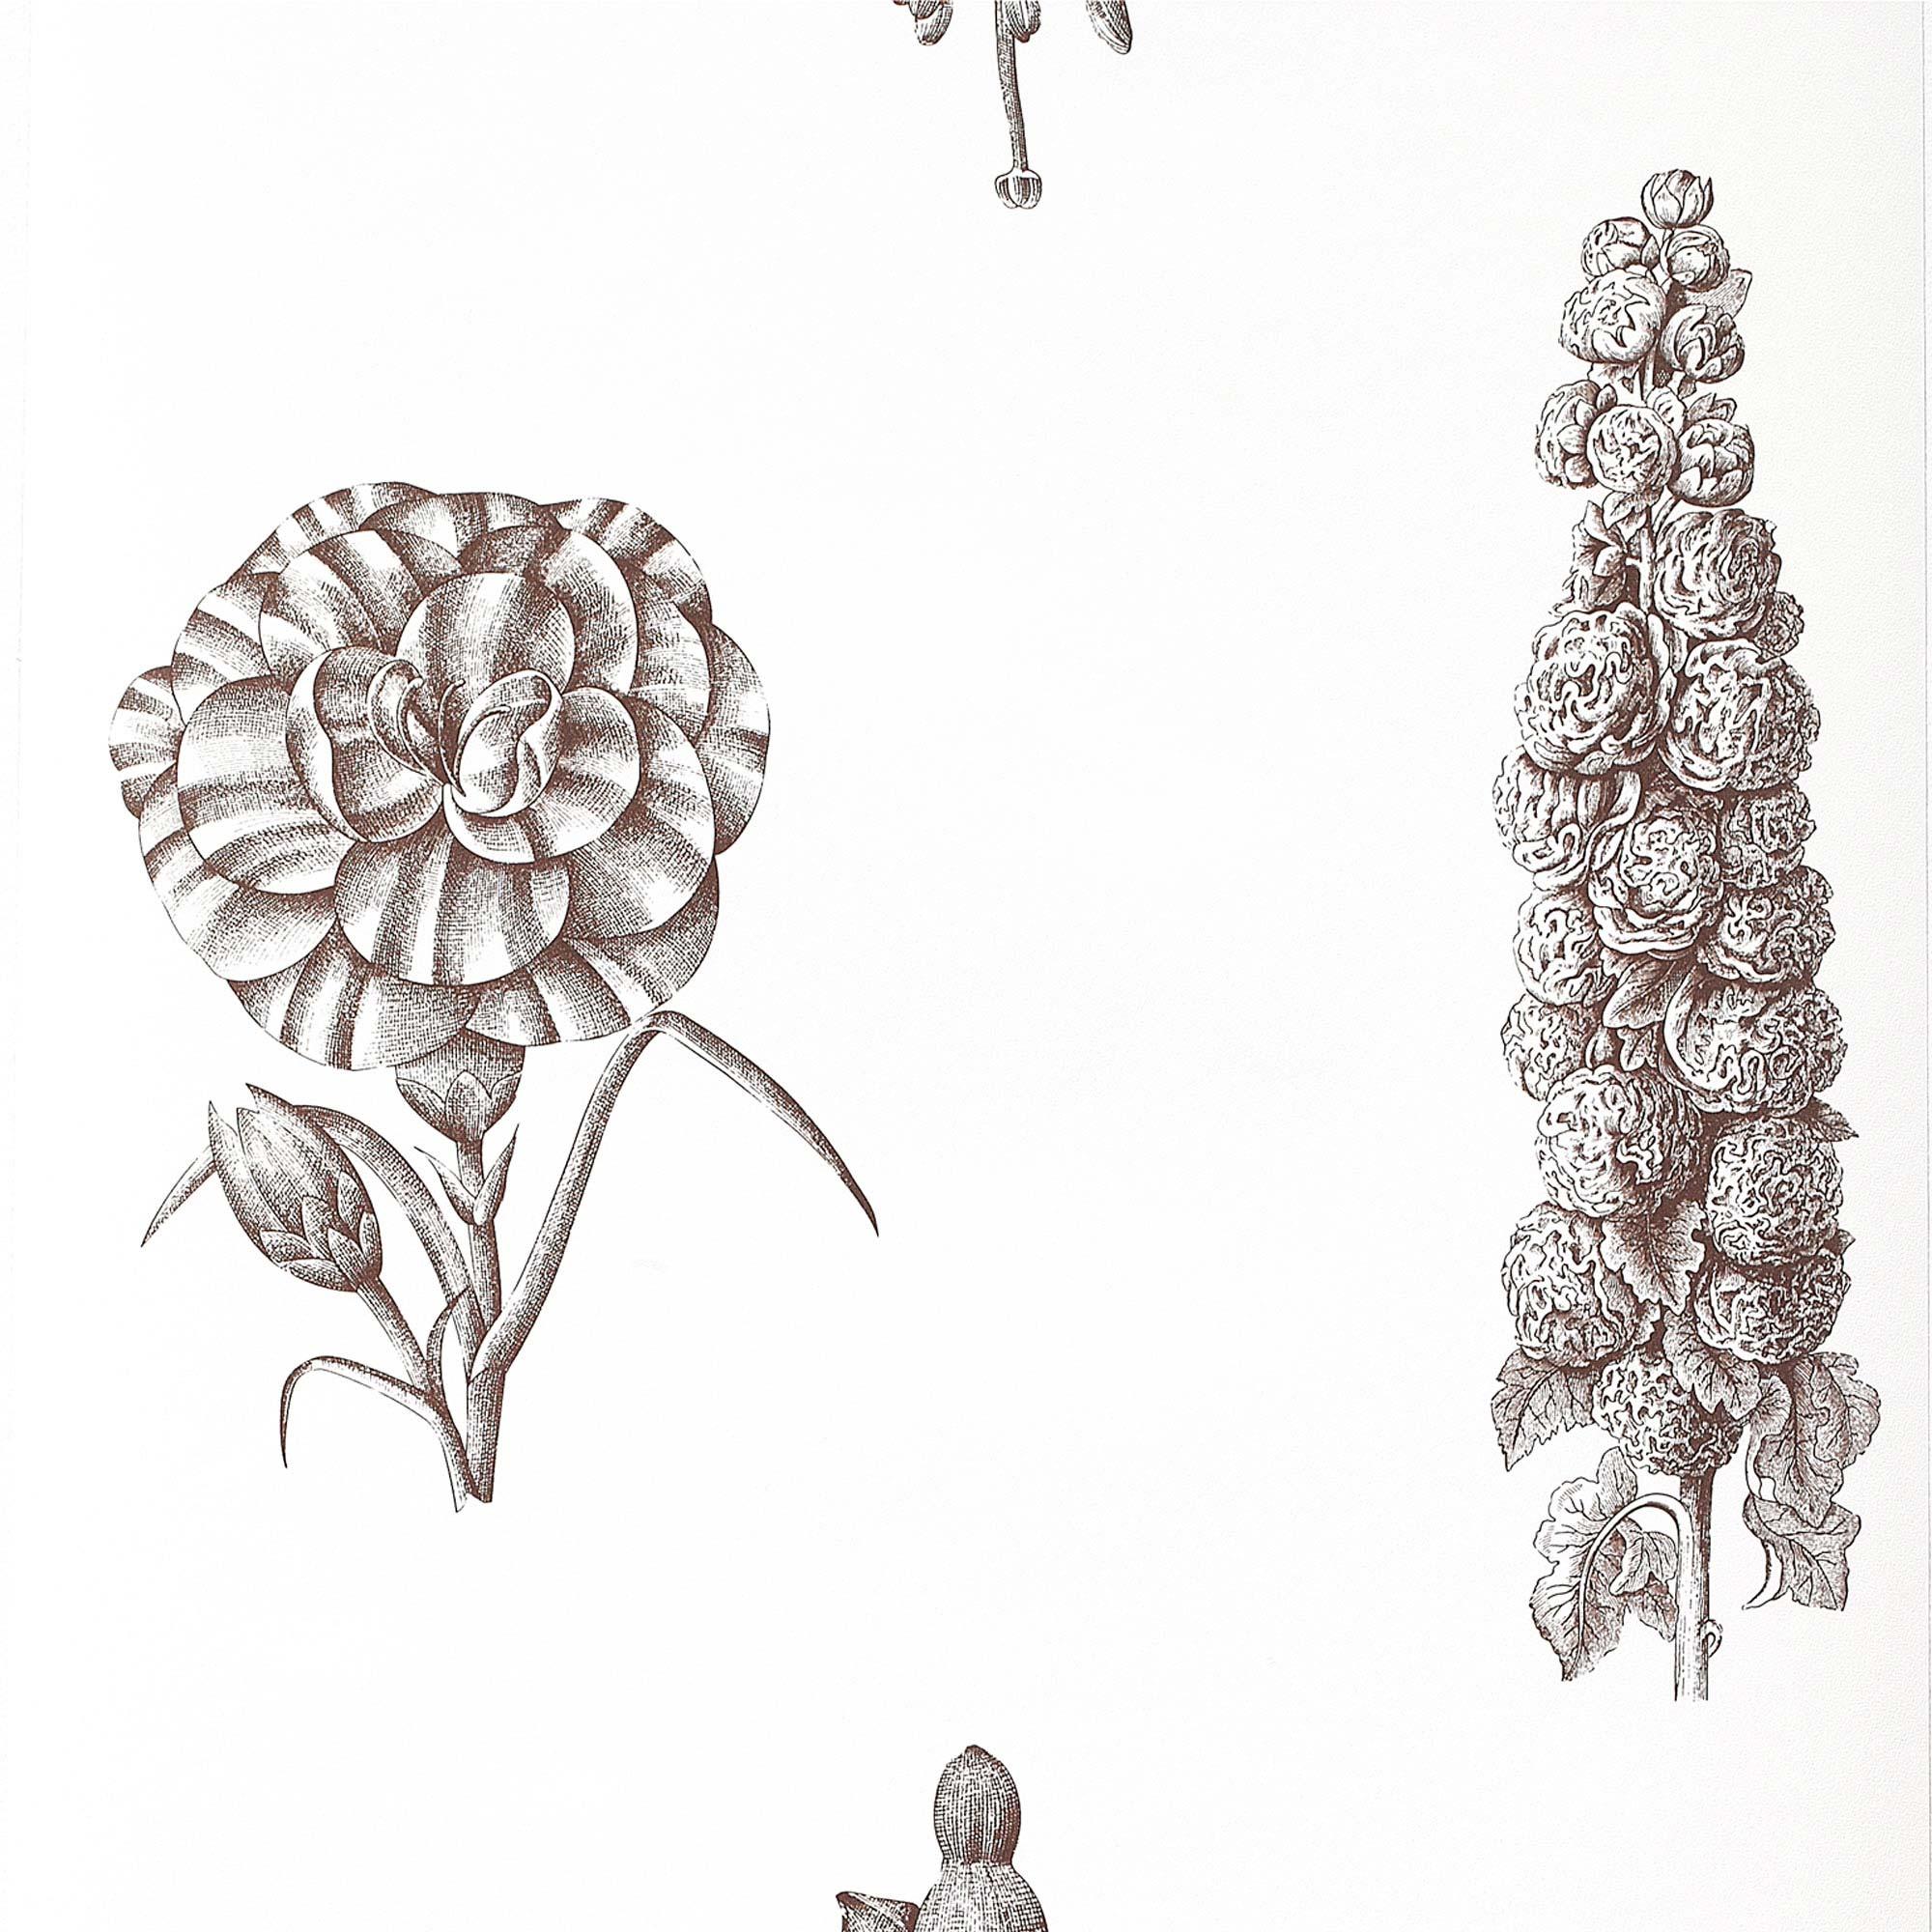 Испанские обои Gaston y Daniela,  коллекция Origen, артикулGDW-4854-004